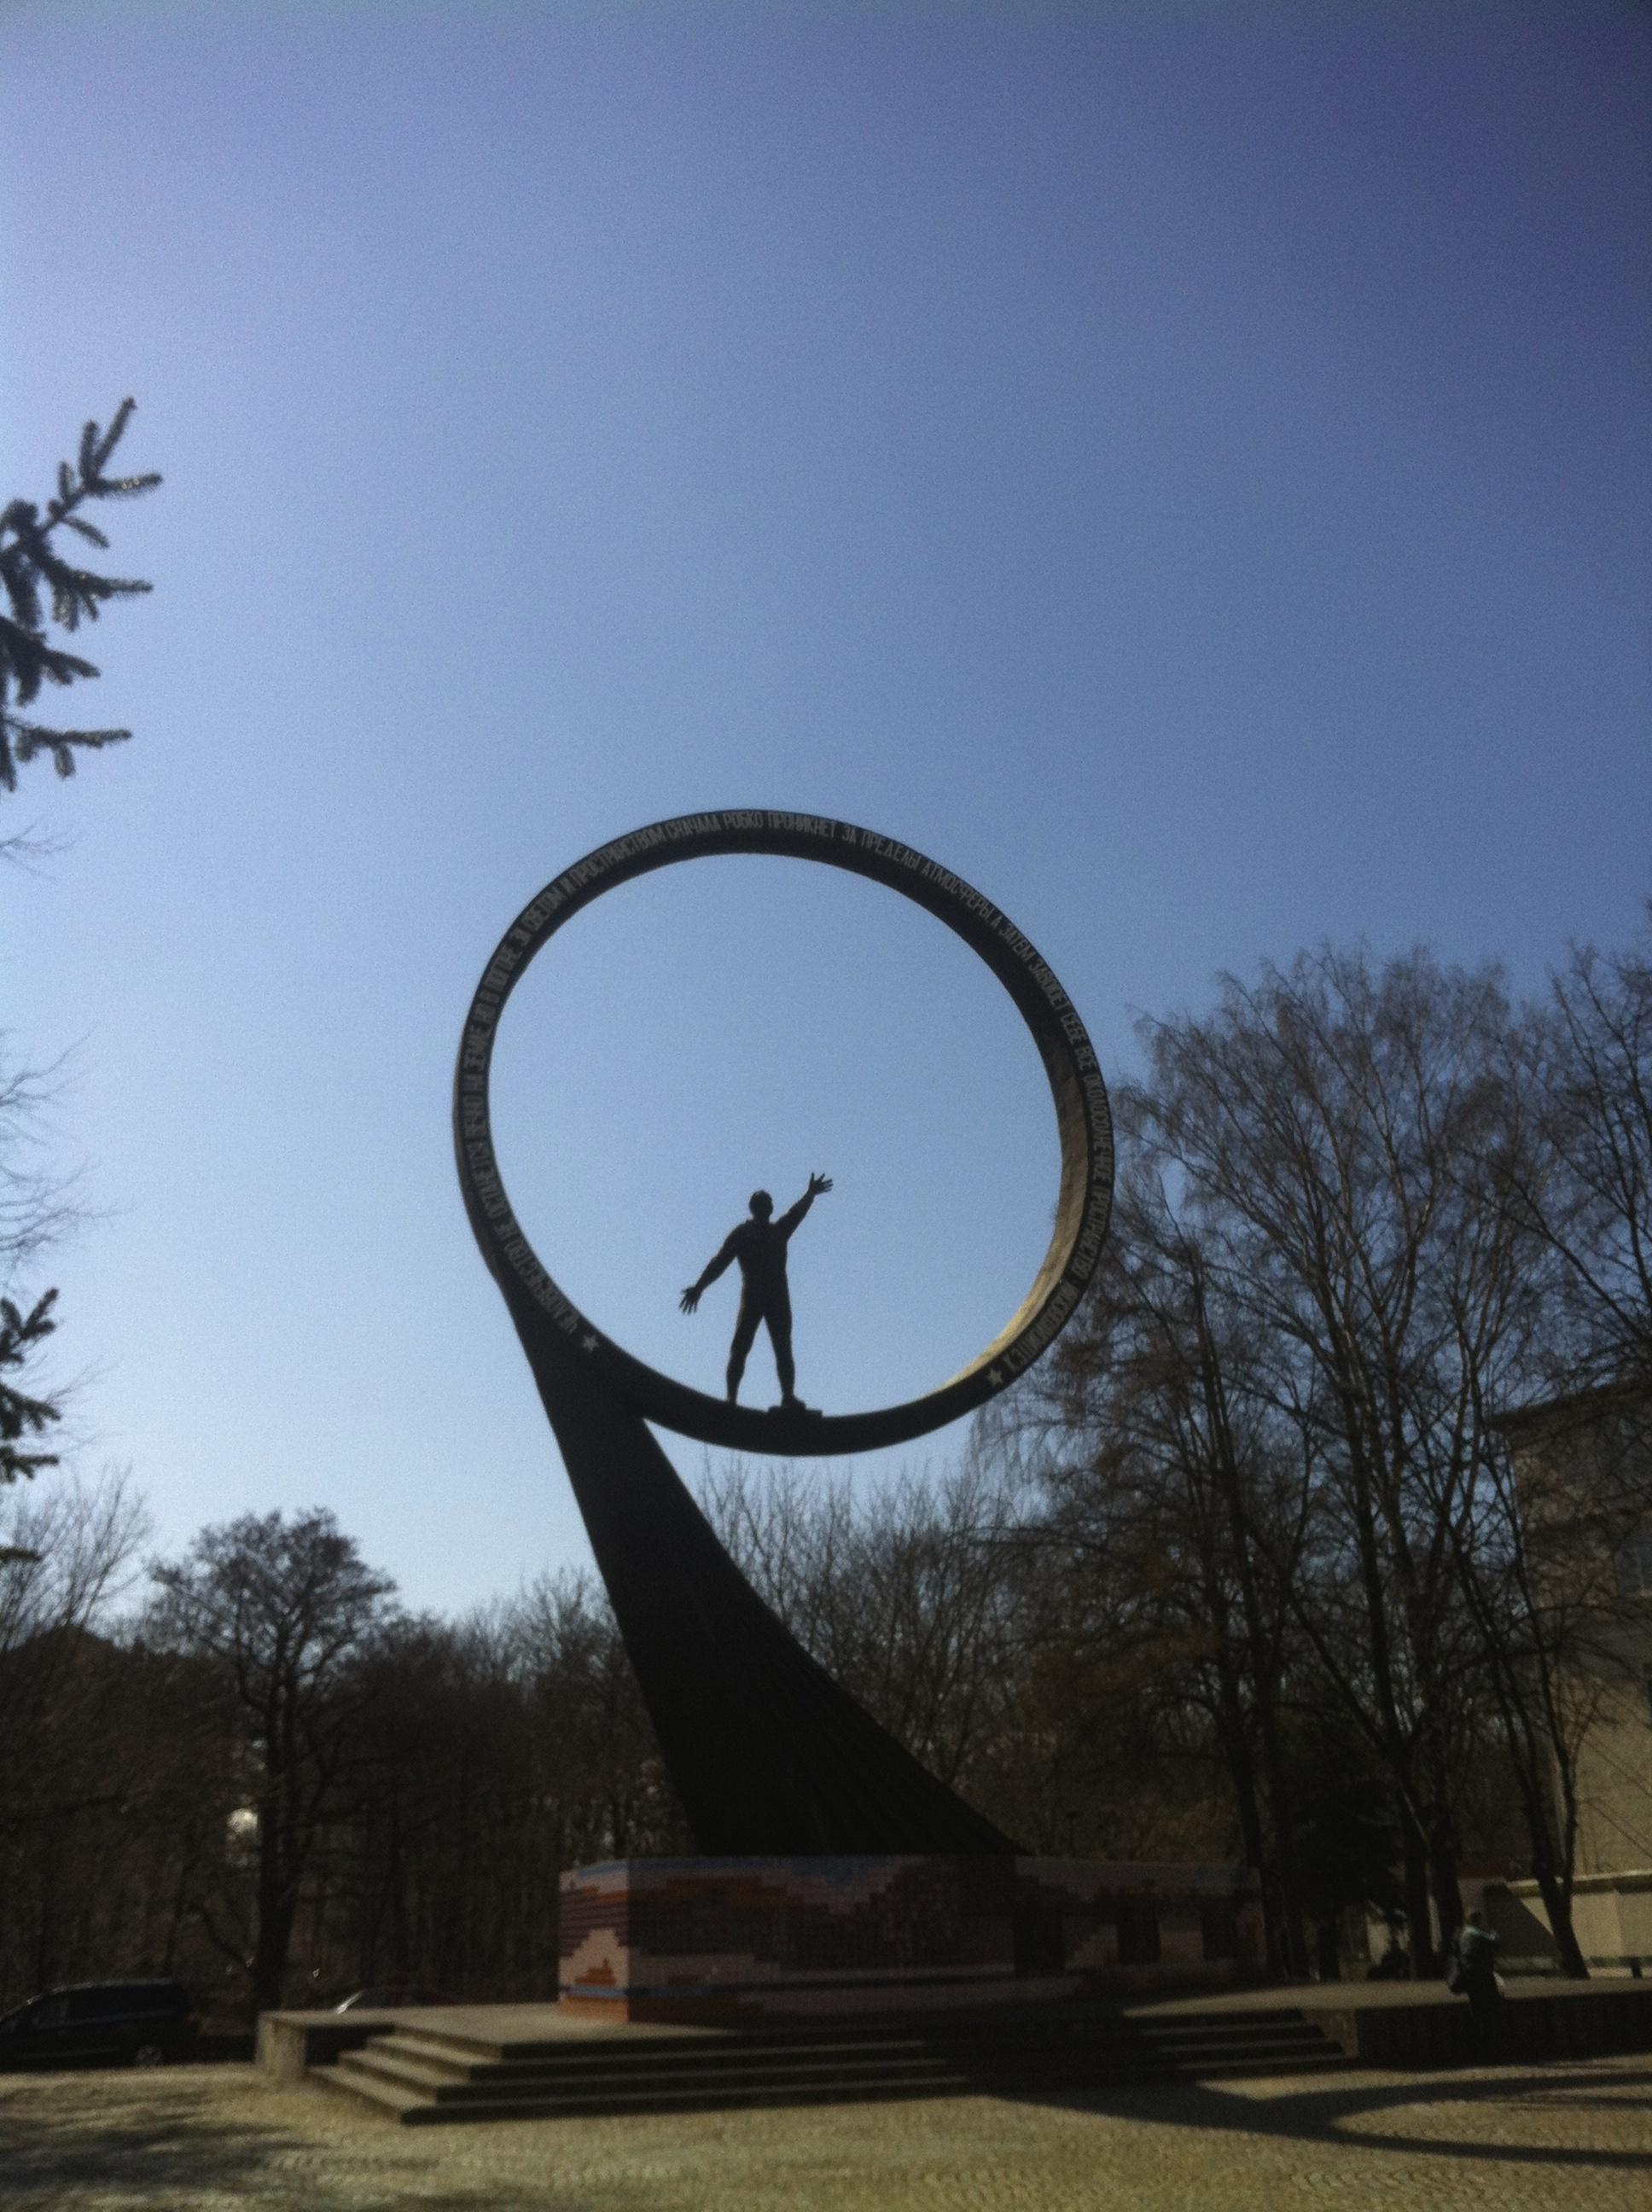 Soviet memorial dedicated to cosmonauts from kaliningrad - Monument For The Cosmonauts